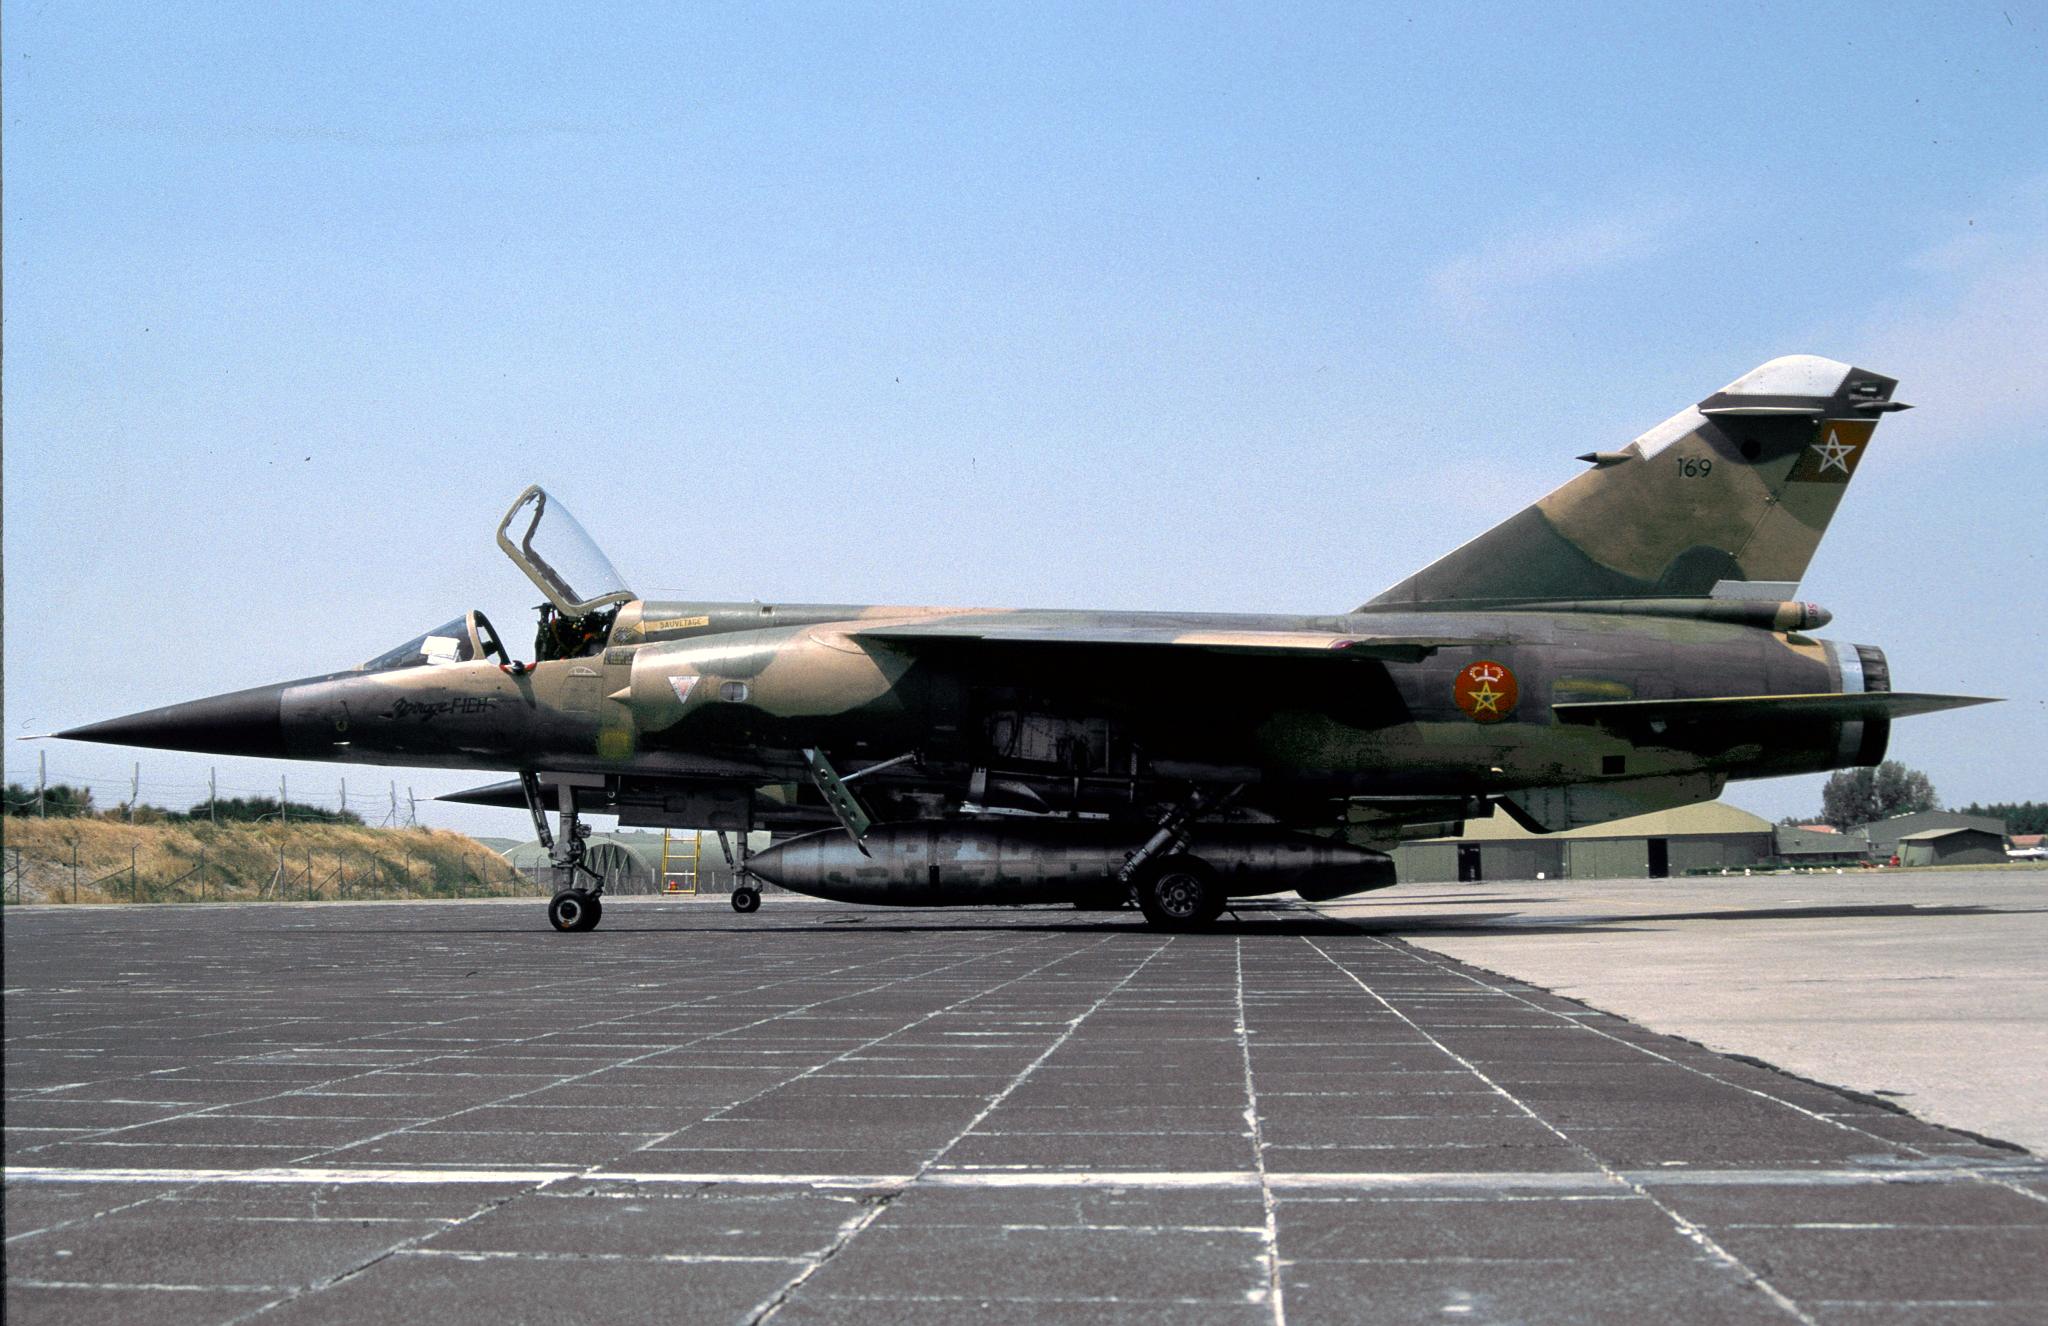 FRA: Photos Mirage F1 - Page 15 45653251244_a97b2fe62a_o